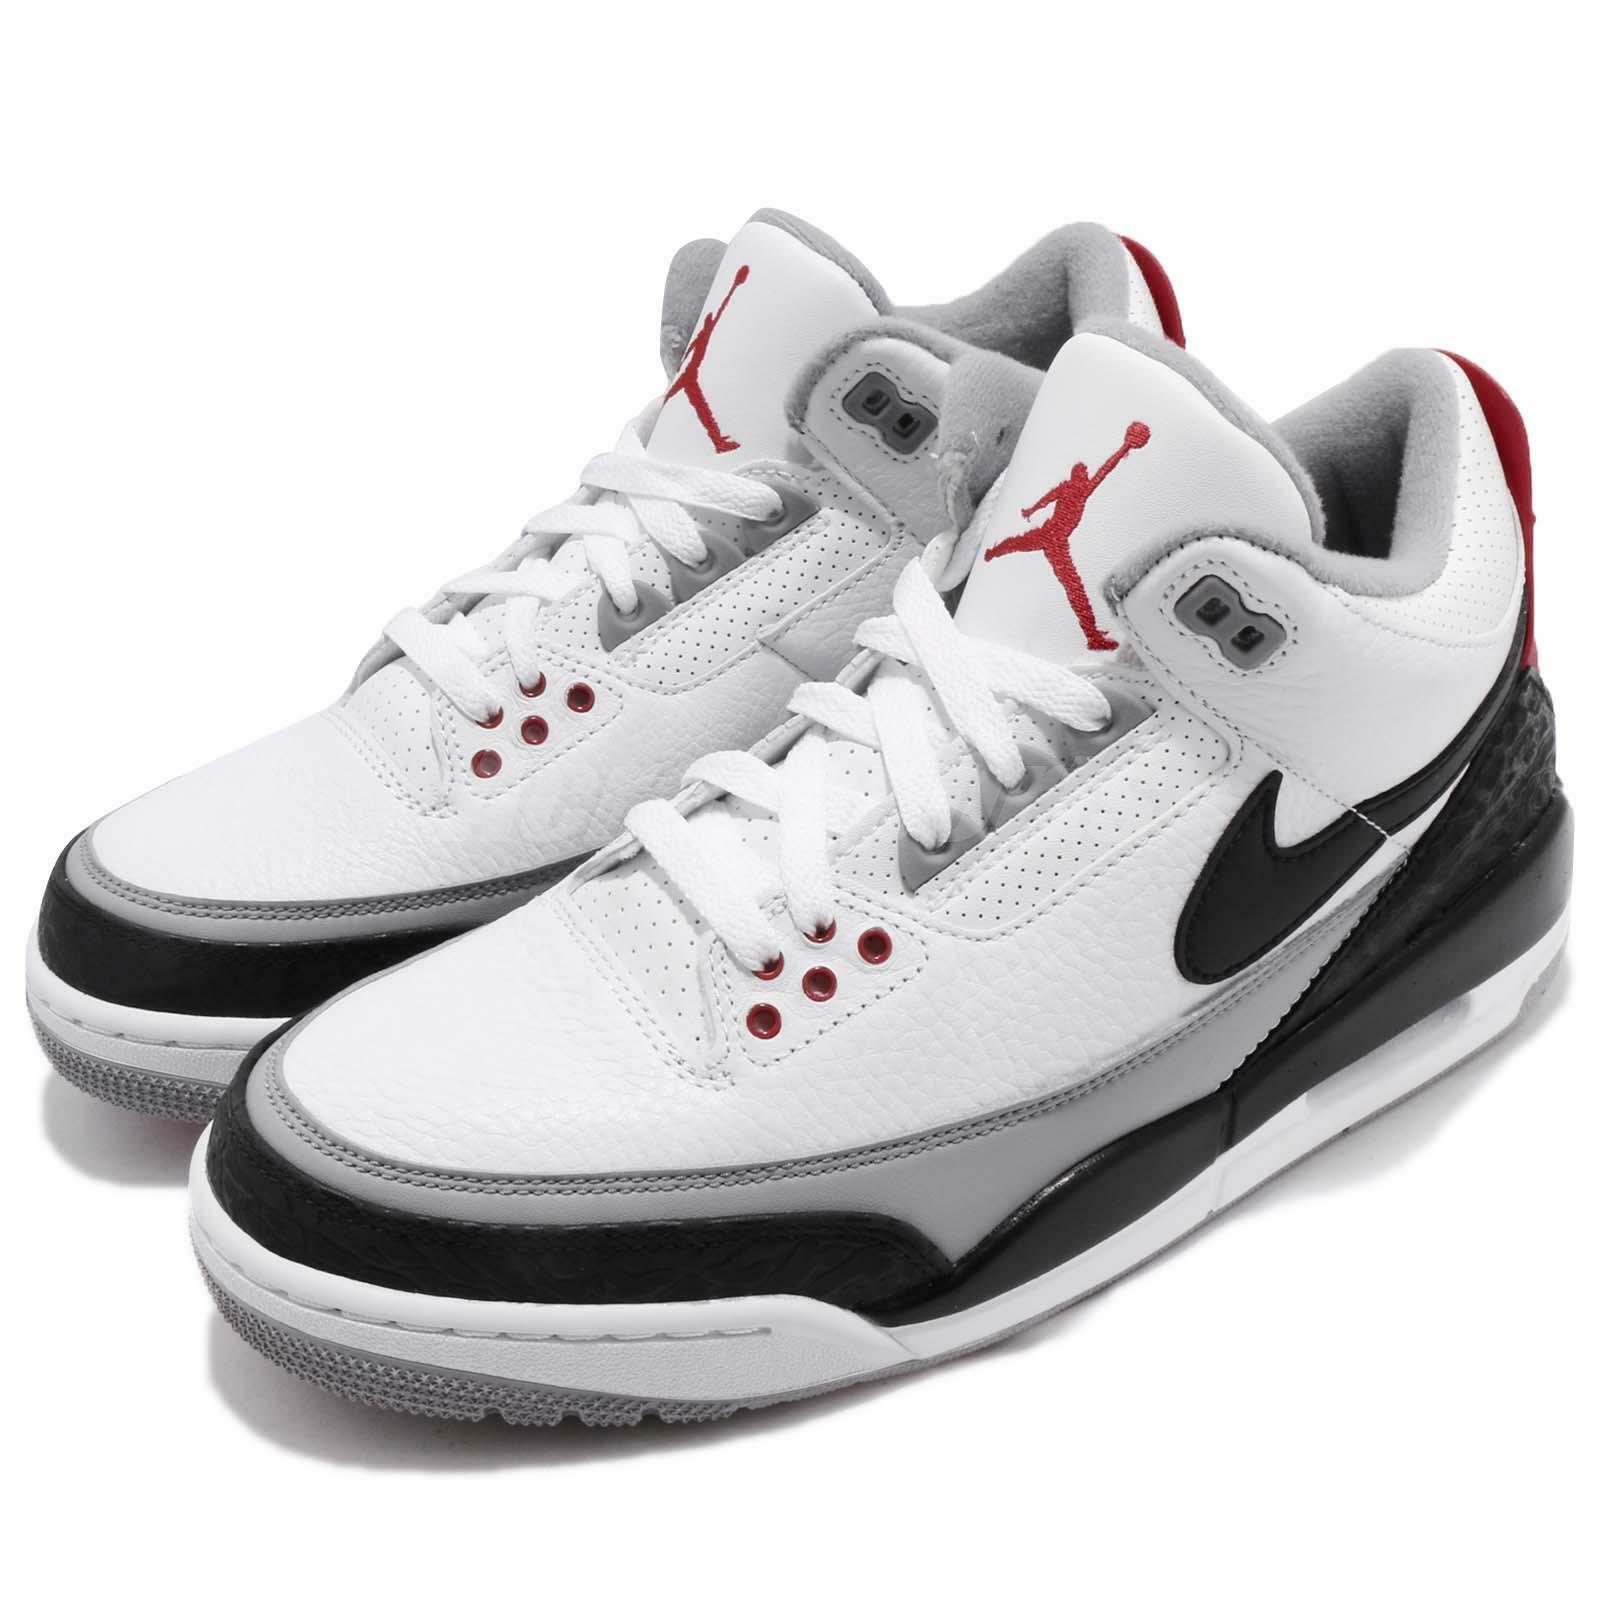 Nike Air Jordan 3 Retro Tinker Hatfield AJ3 NRG III Negro Cemento AJ3 Hatfield de hombre AQ3835160 bd0c5b